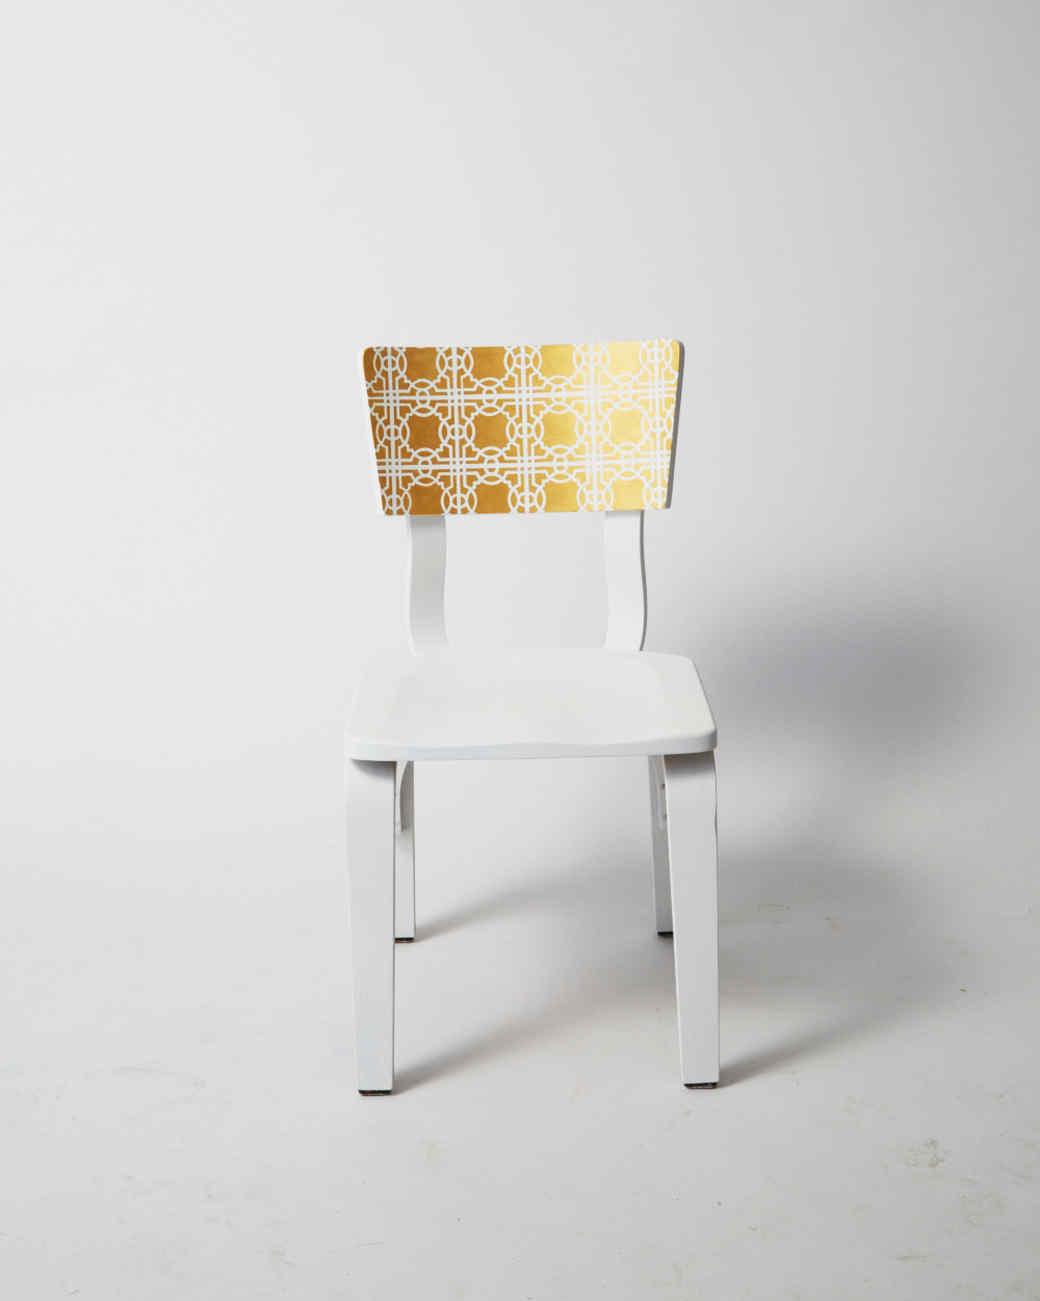 Golden Stenciled Chair